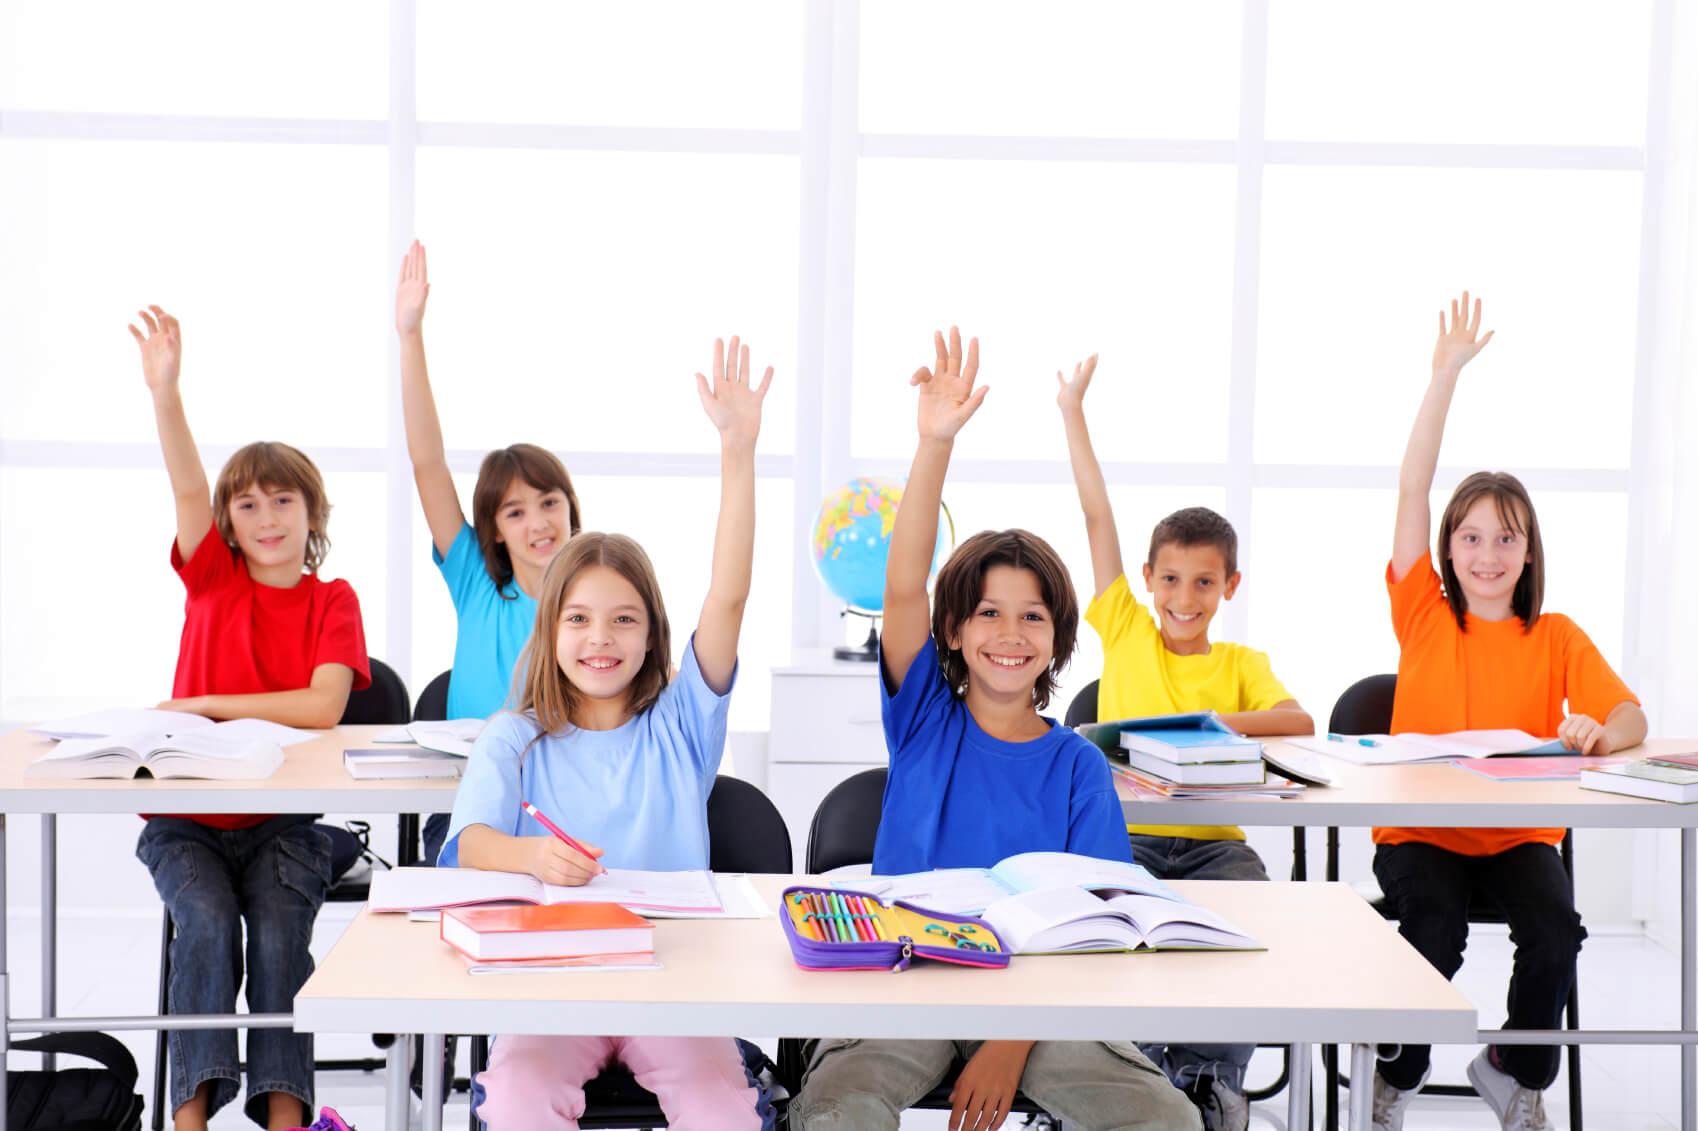 Cute school students raising hands in a modern classroom.